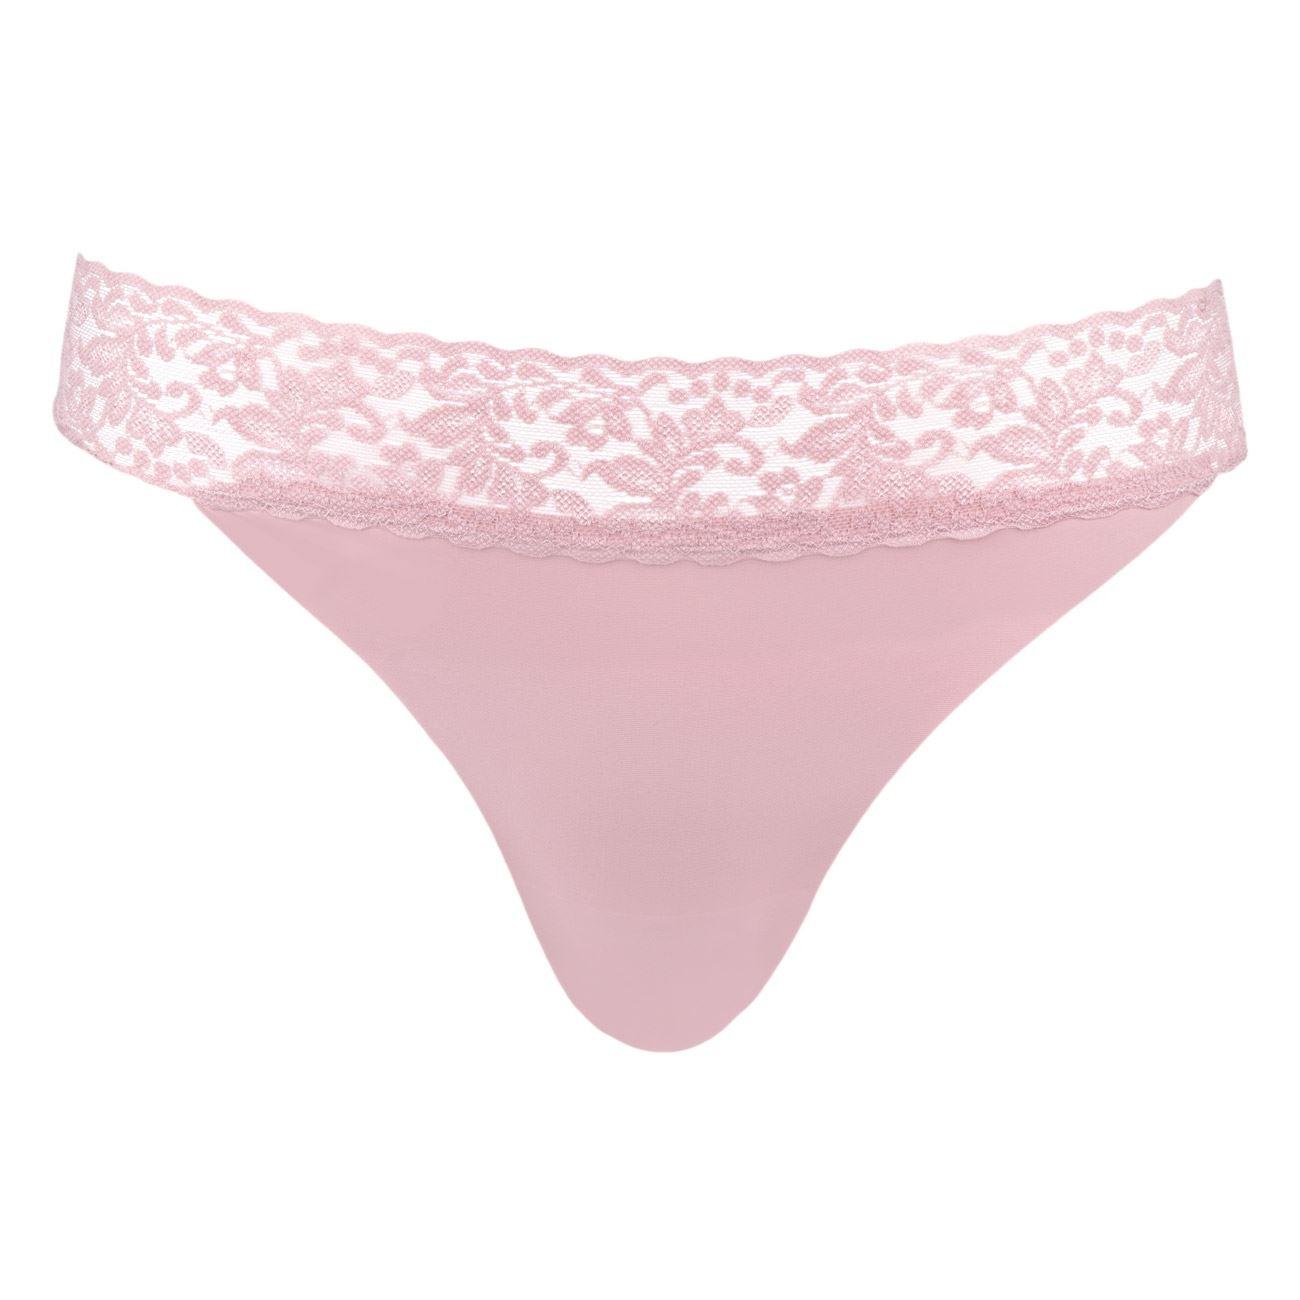 67391ae1fdd Εσώρουχο Γυναικείο String Lasercut Nude Δαντέλα - One Size